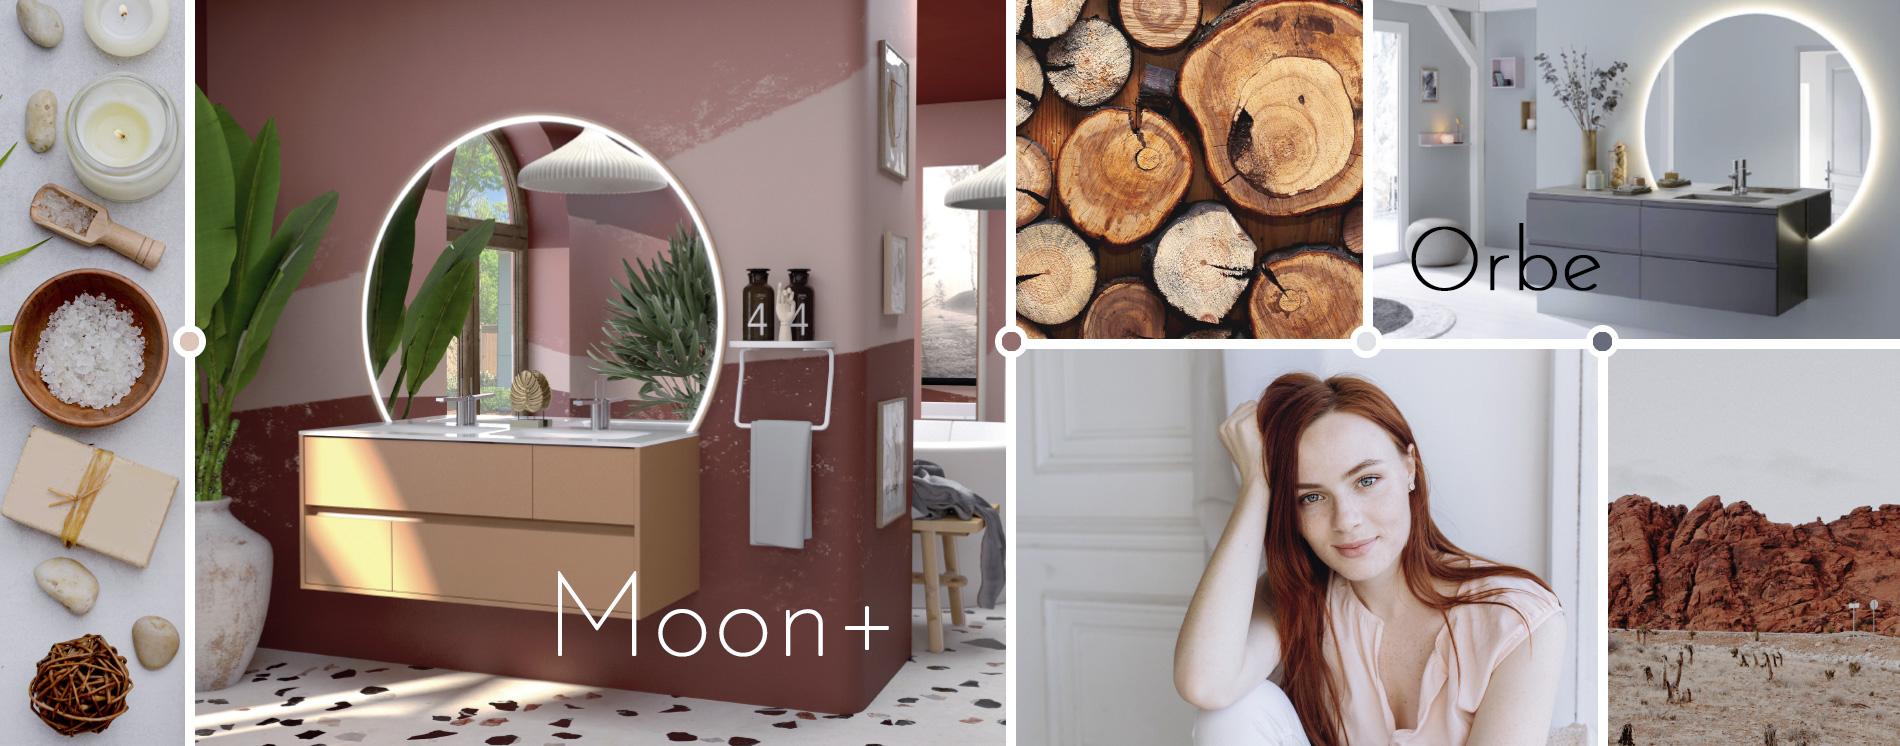 Miroirs Orbe et Moon+